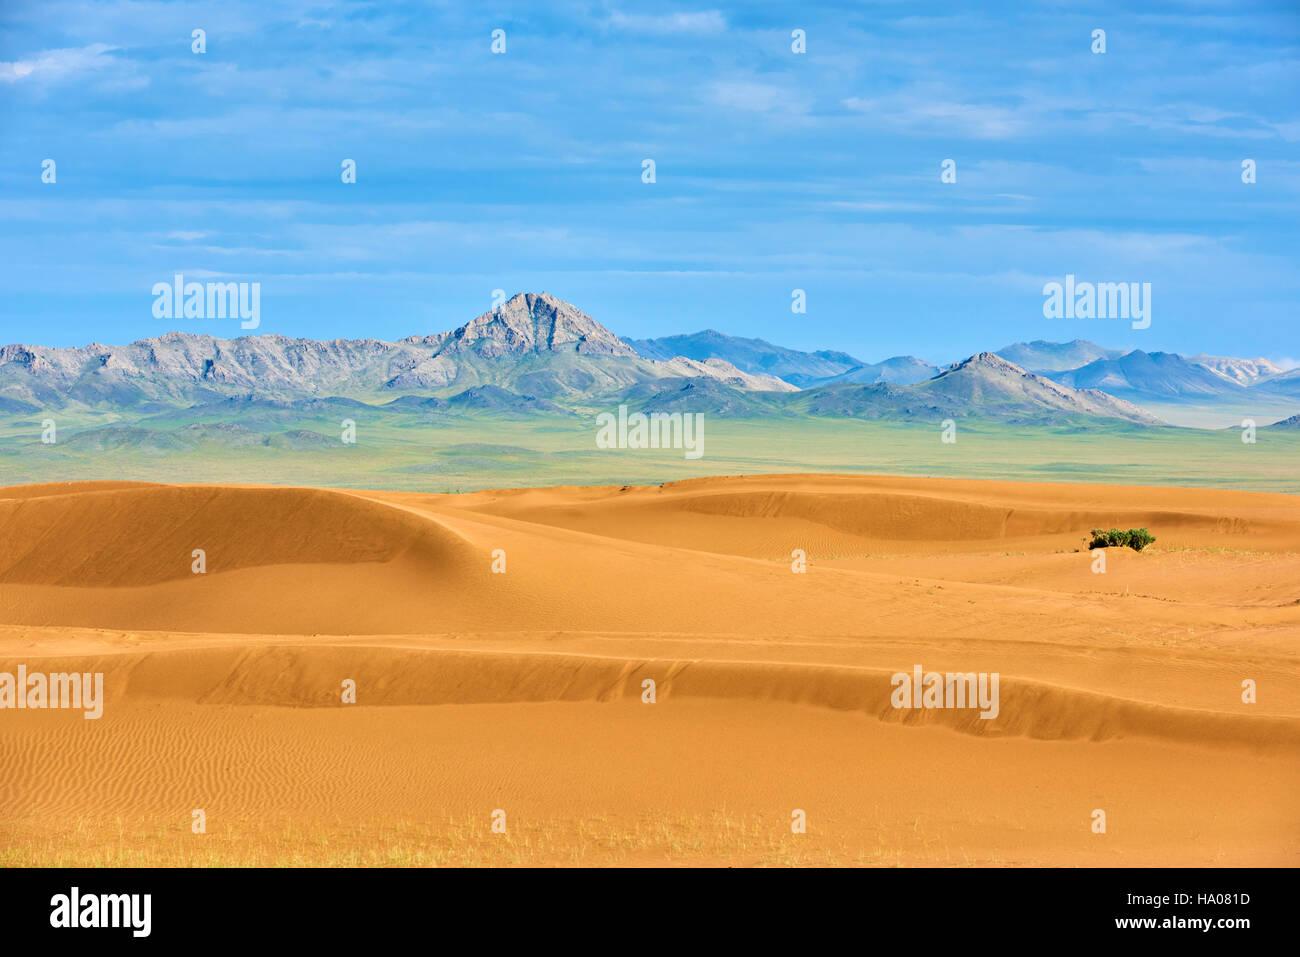 Mongolia, Zavkhan province, deserted landscape of sand dunes in the steppe - Stock Image